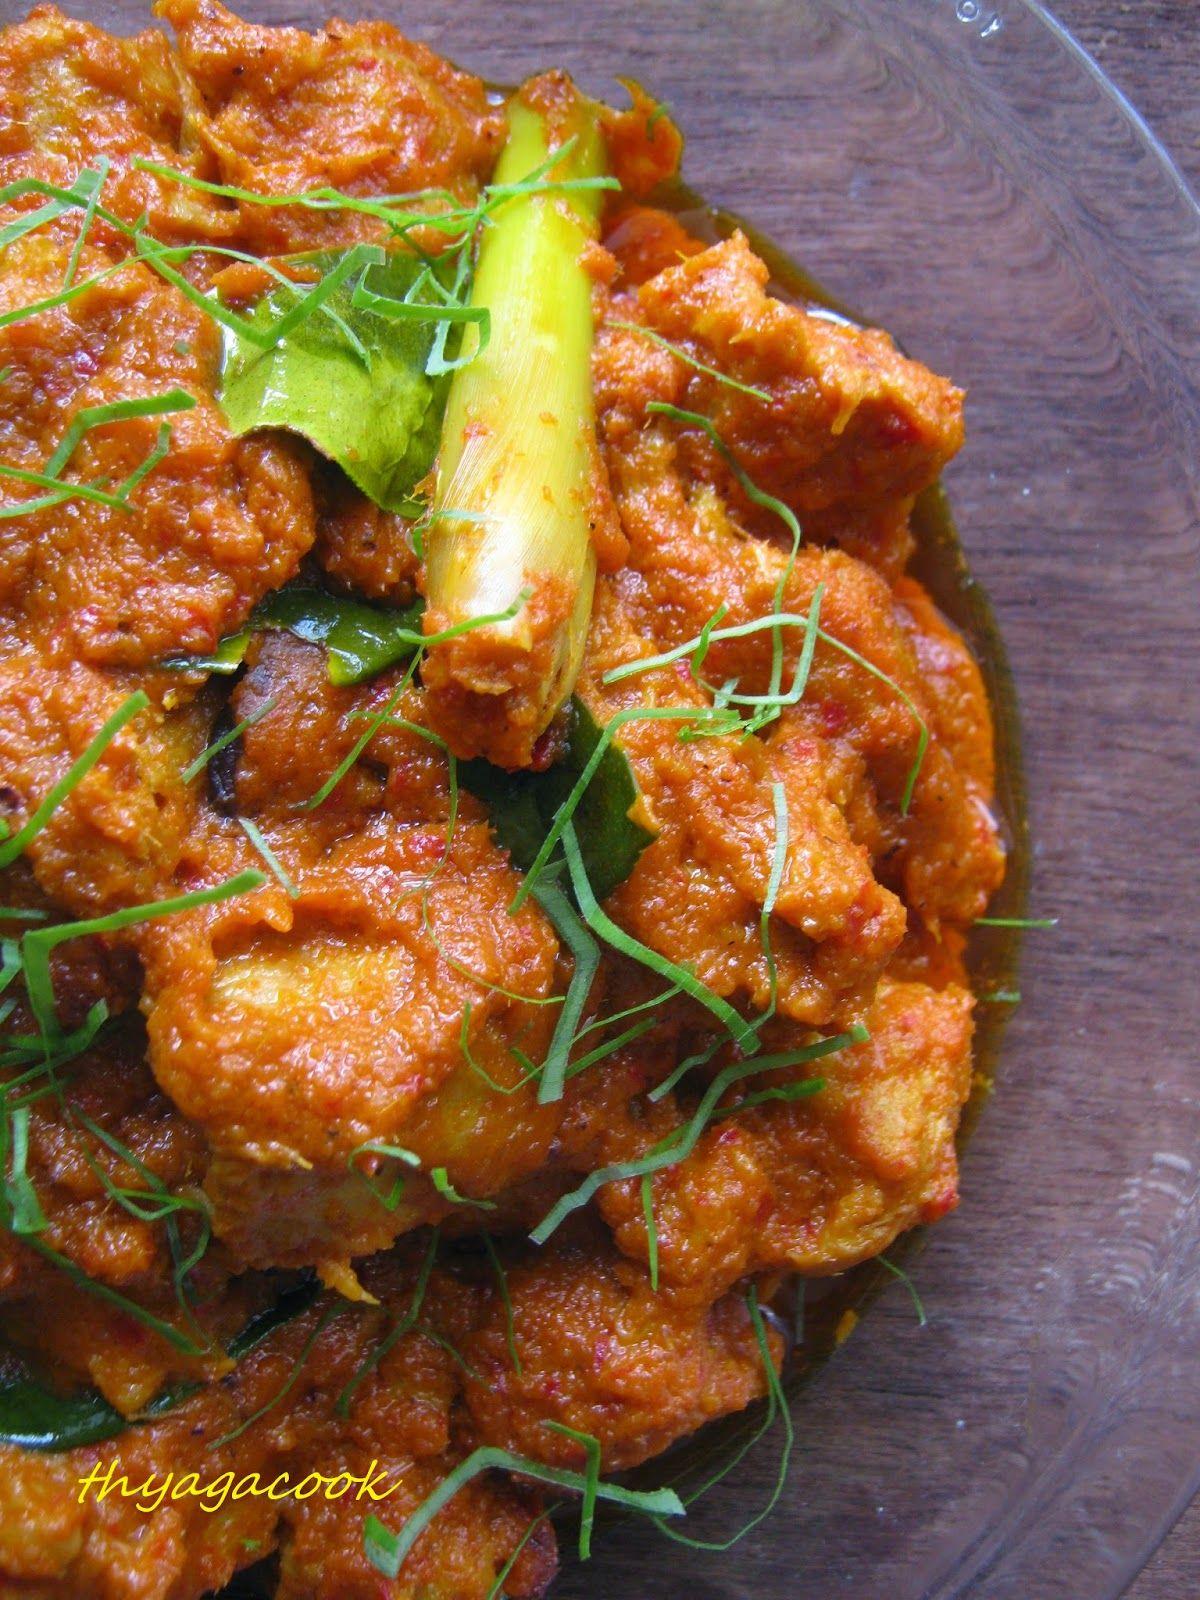 Kari leafs malaysian flavours vegetarian chicken rendang malaysian flavours vegetarian chicken rendang forumfinder Images